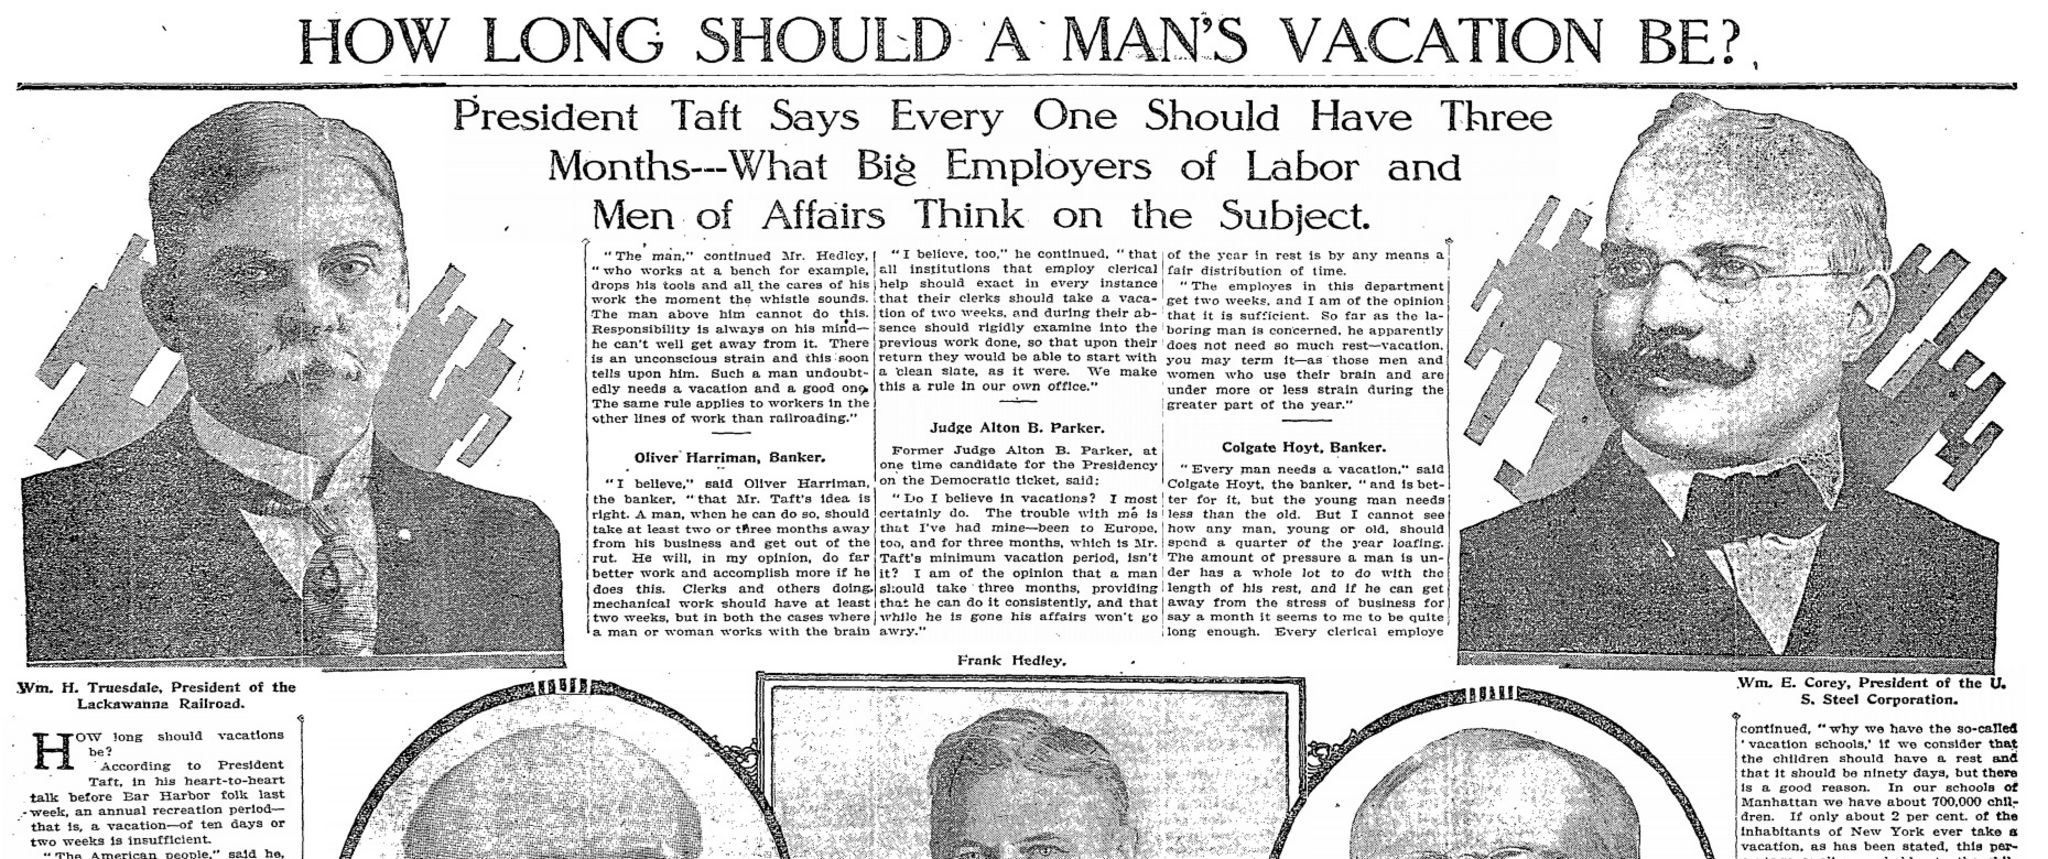 New York Times headline